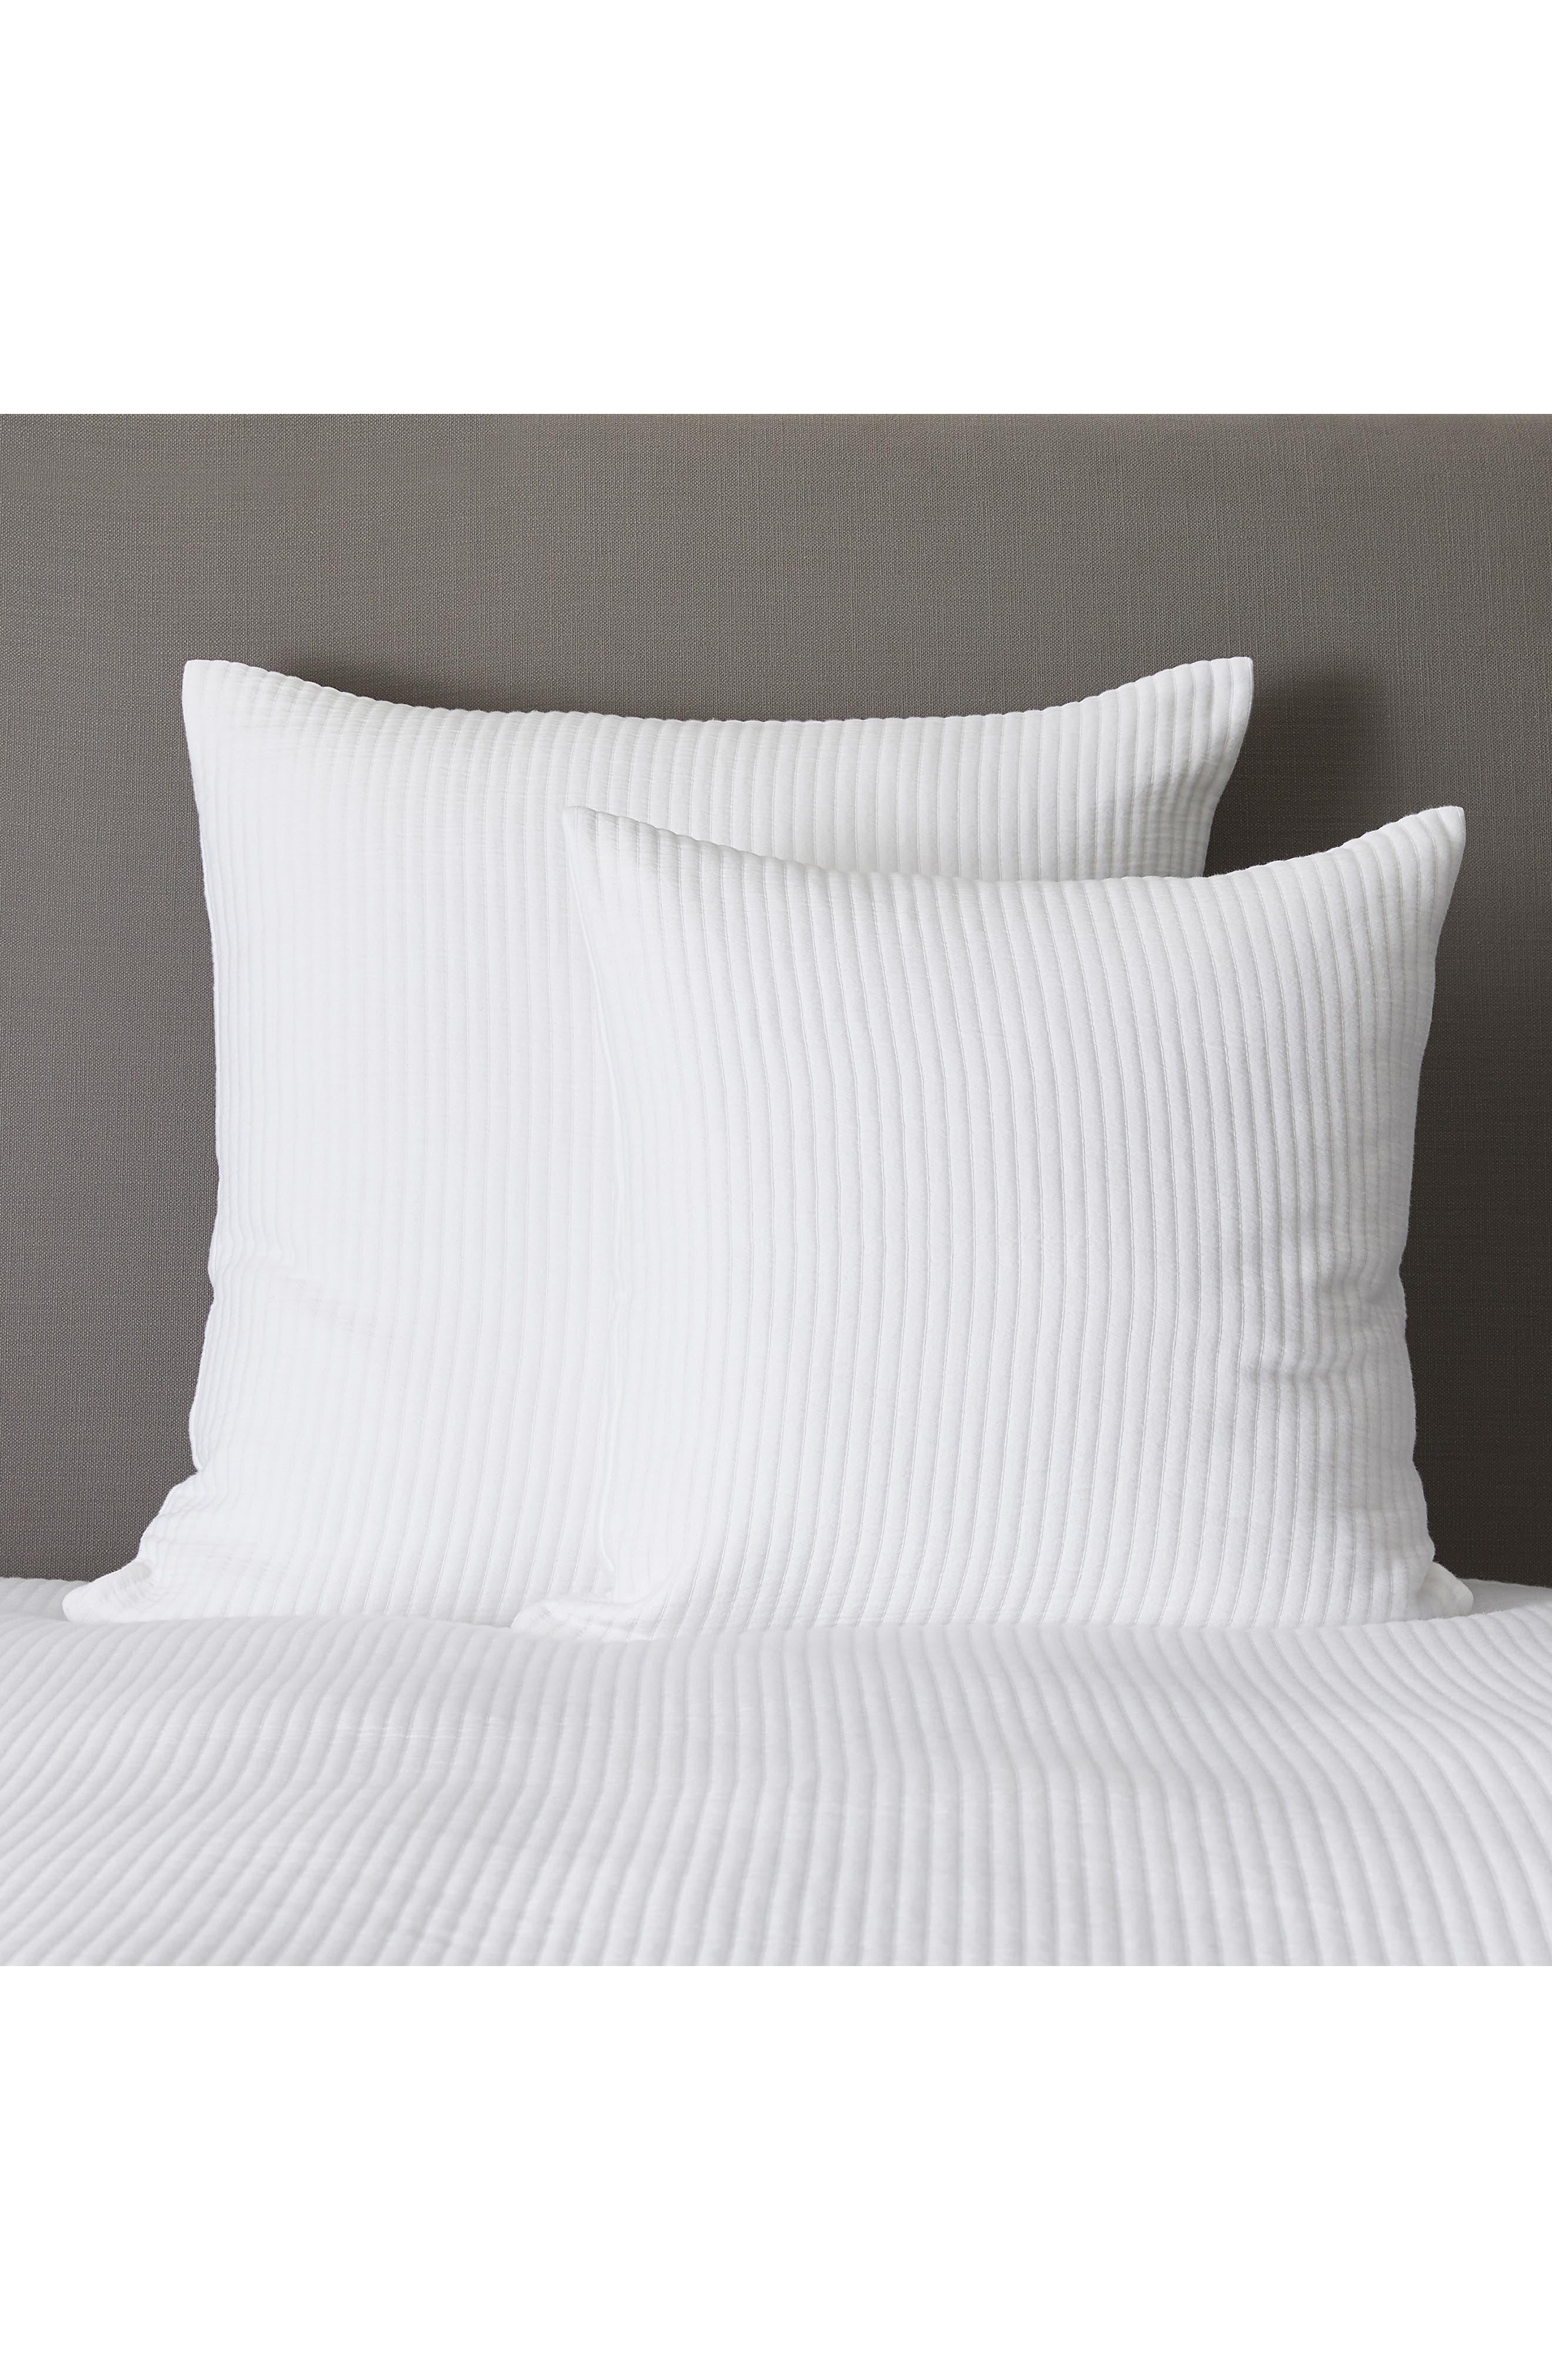 THE WHITE COMPANY Classic Rib Cushion Cover, Main, color, WHITE